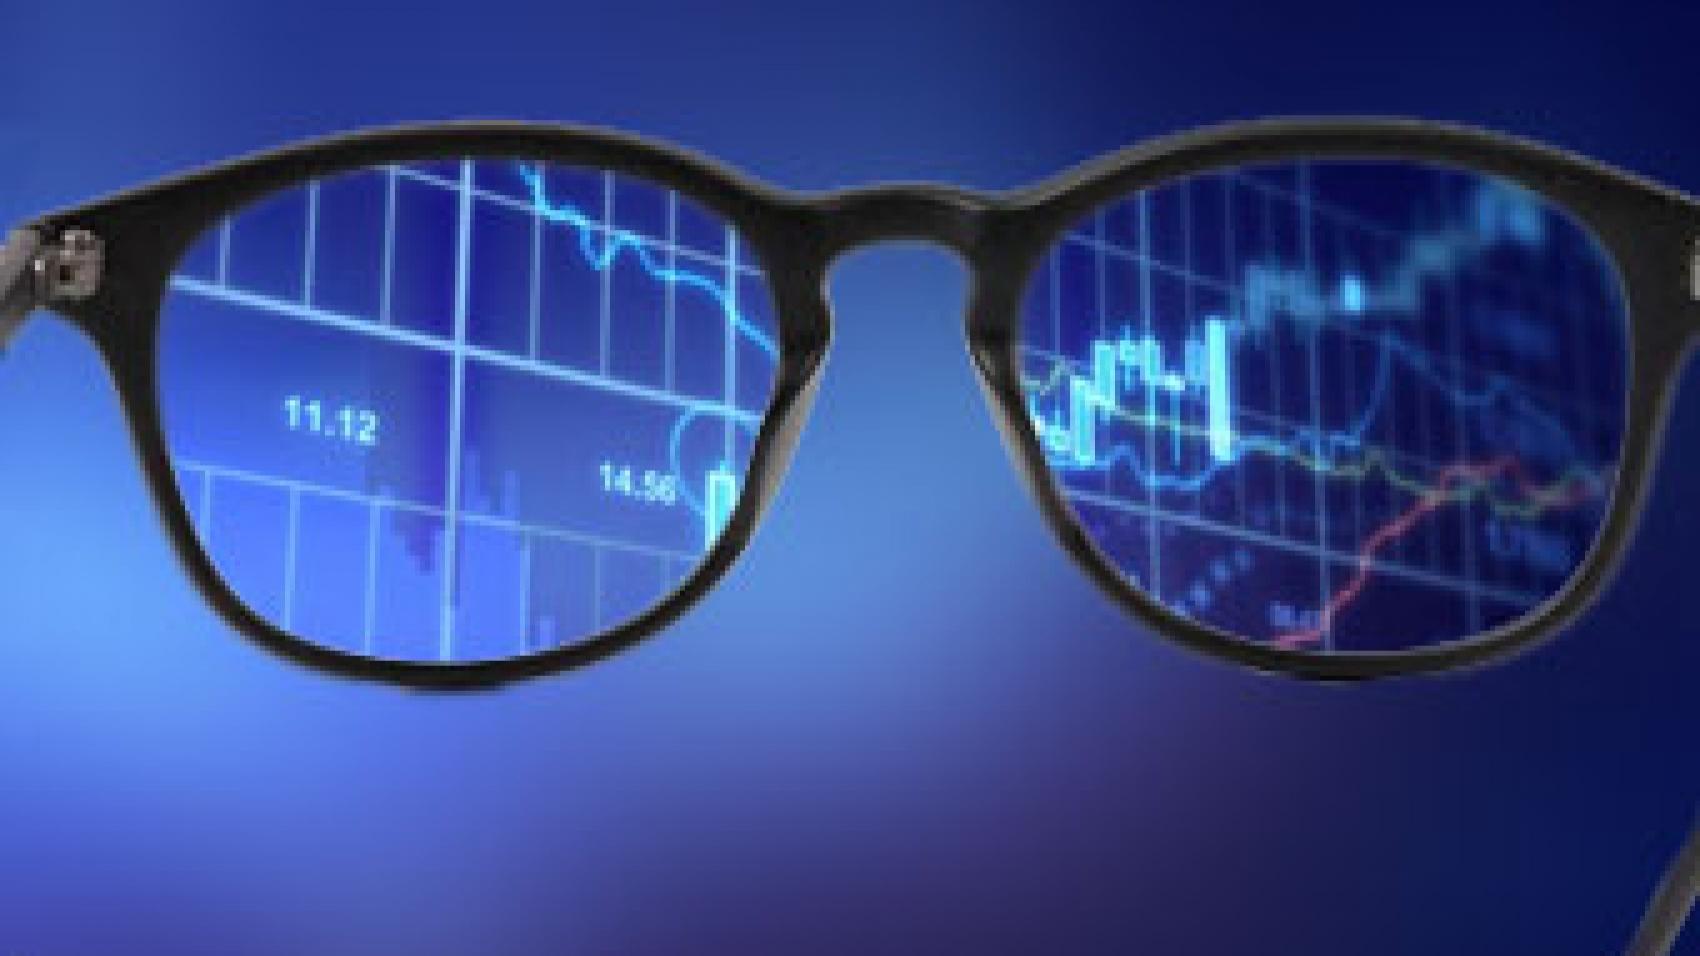 eyeglasses reflecting a graph